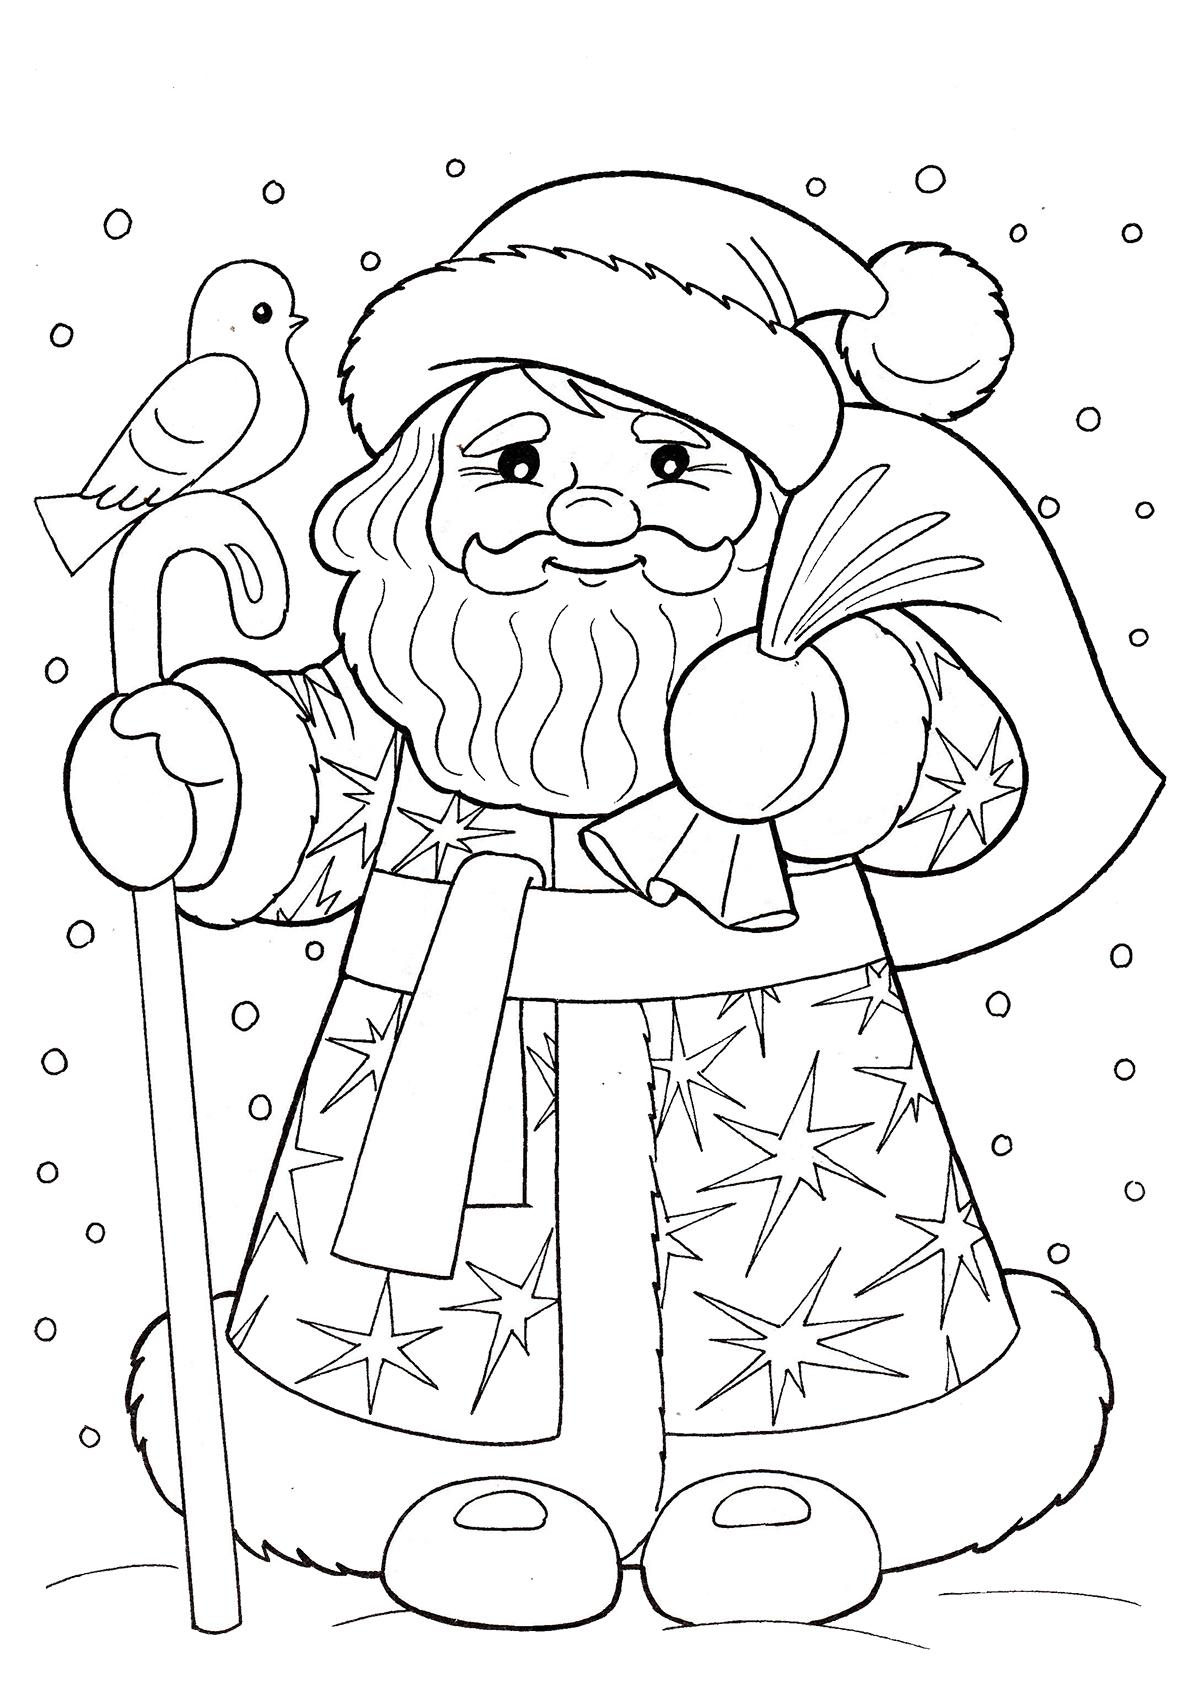 Рисунок ёлки с подарками карандашом